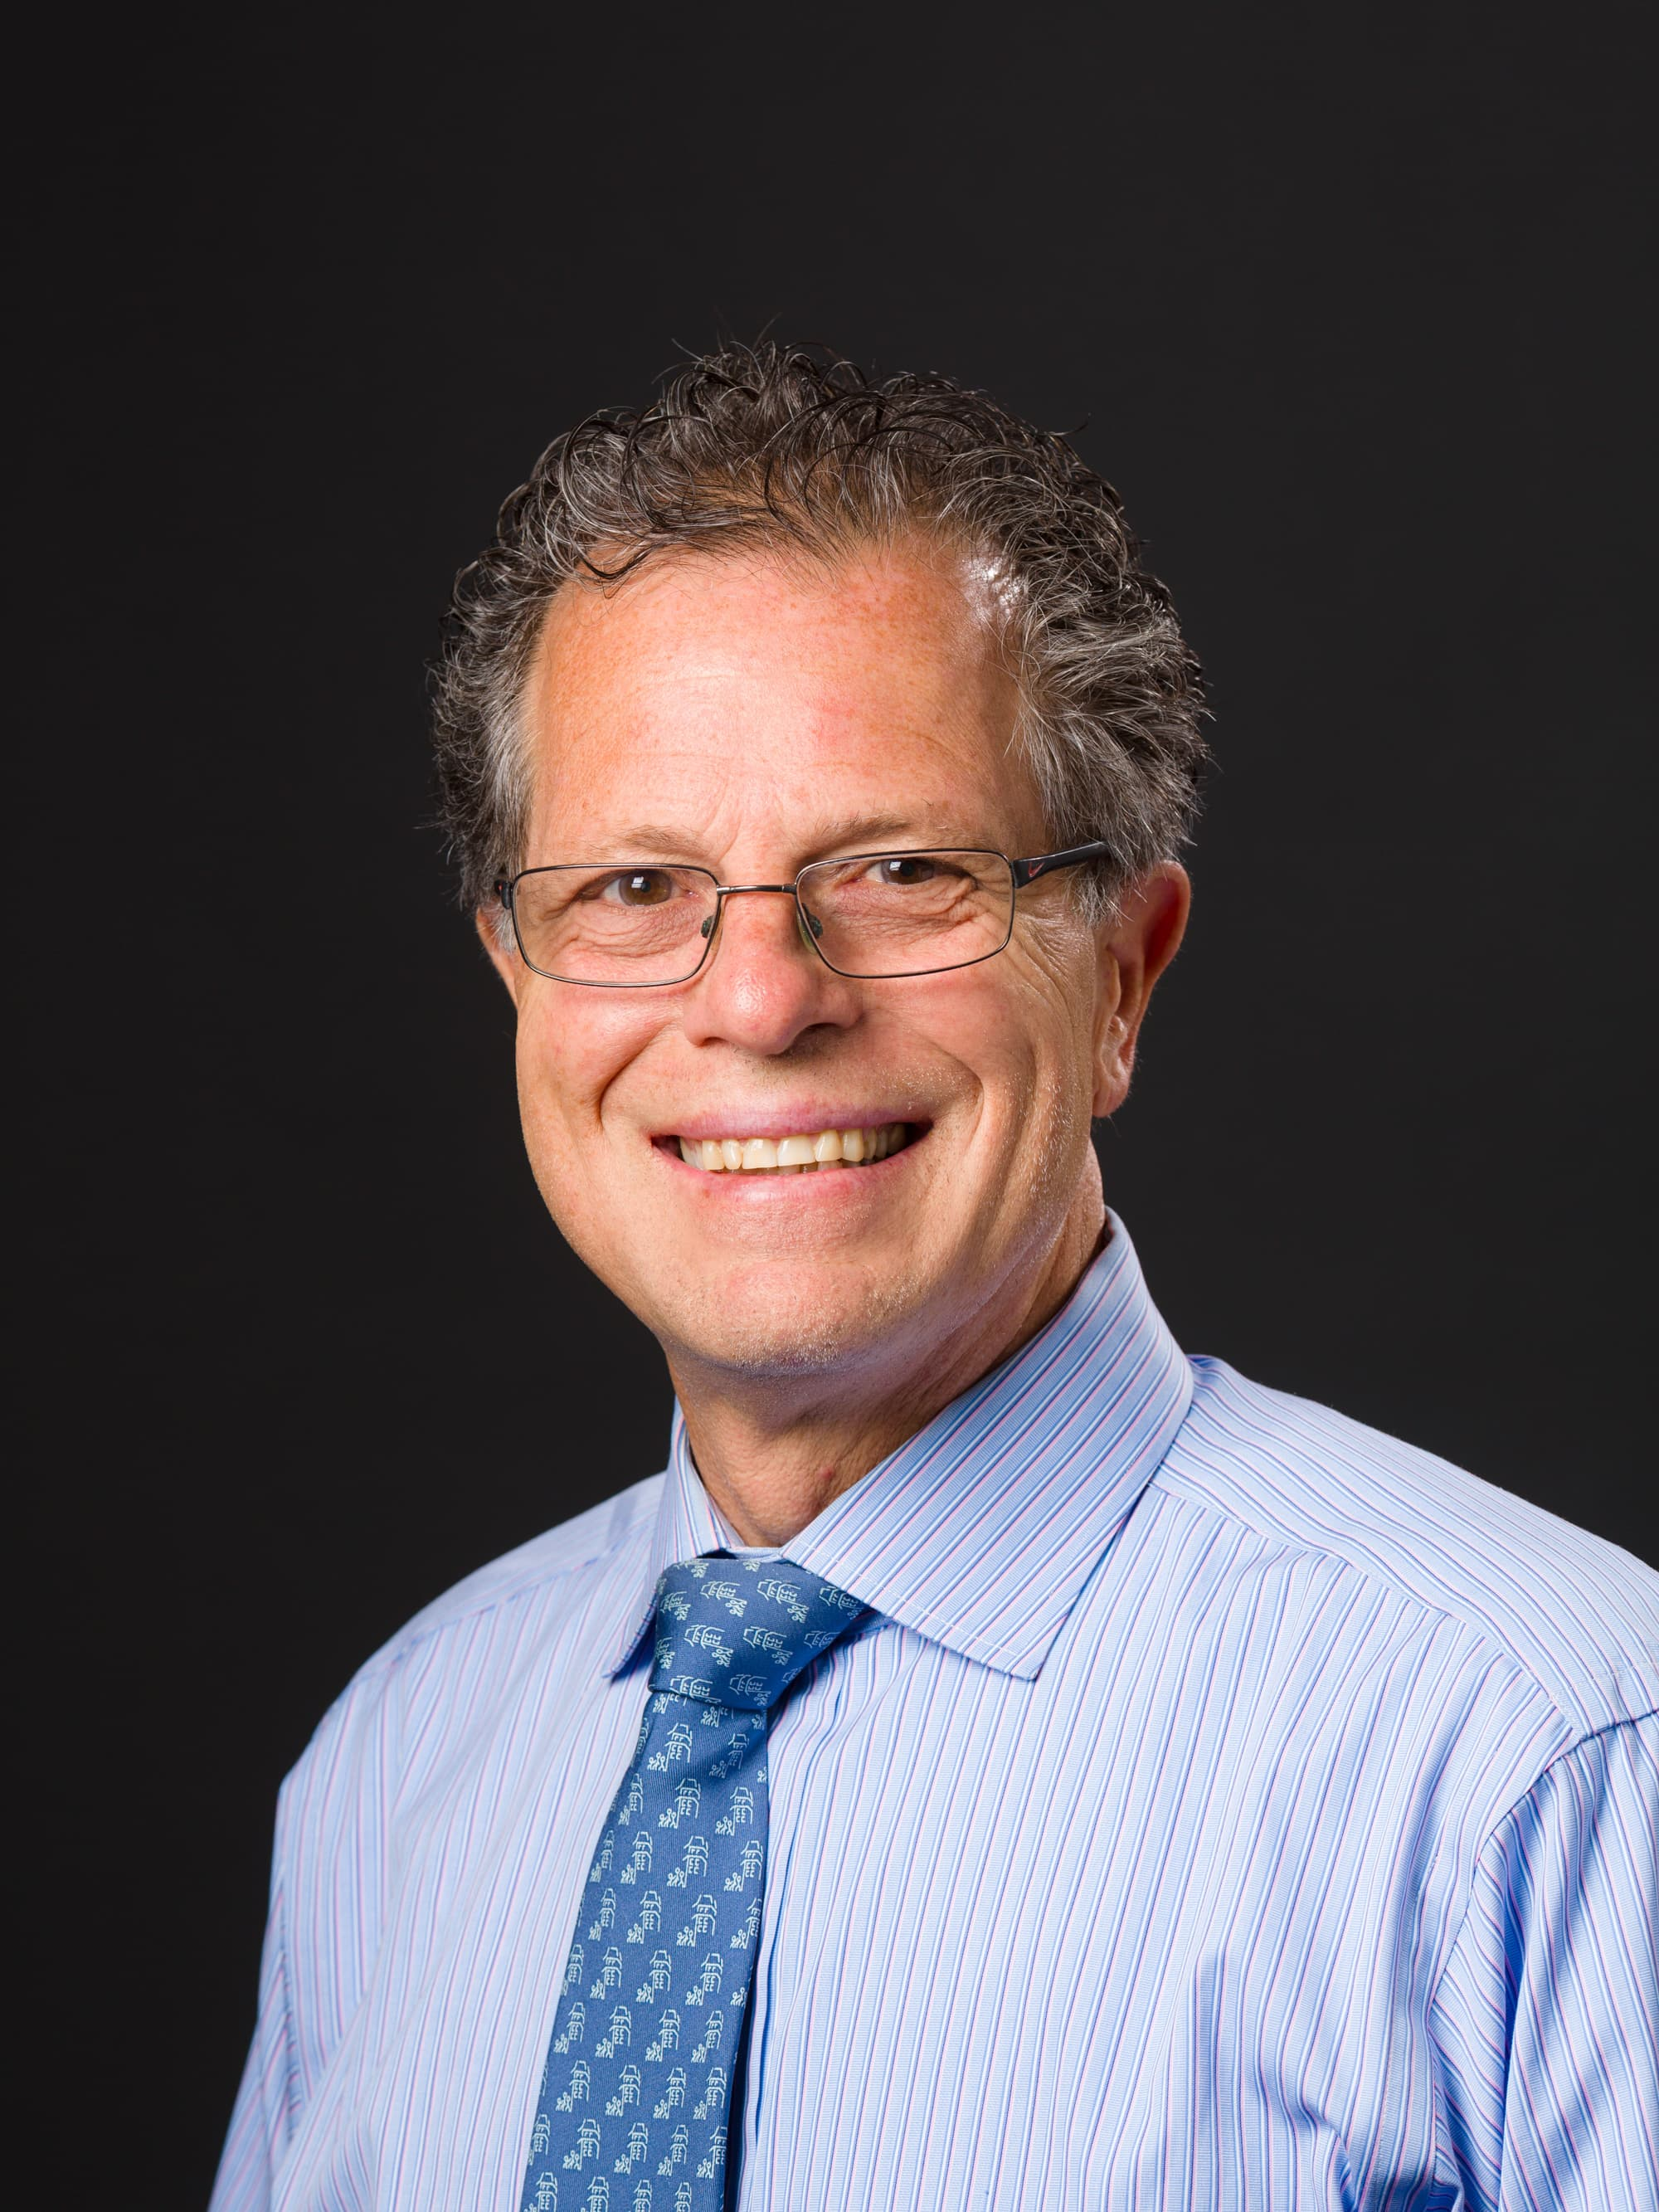 Lawrence A. Vitulano